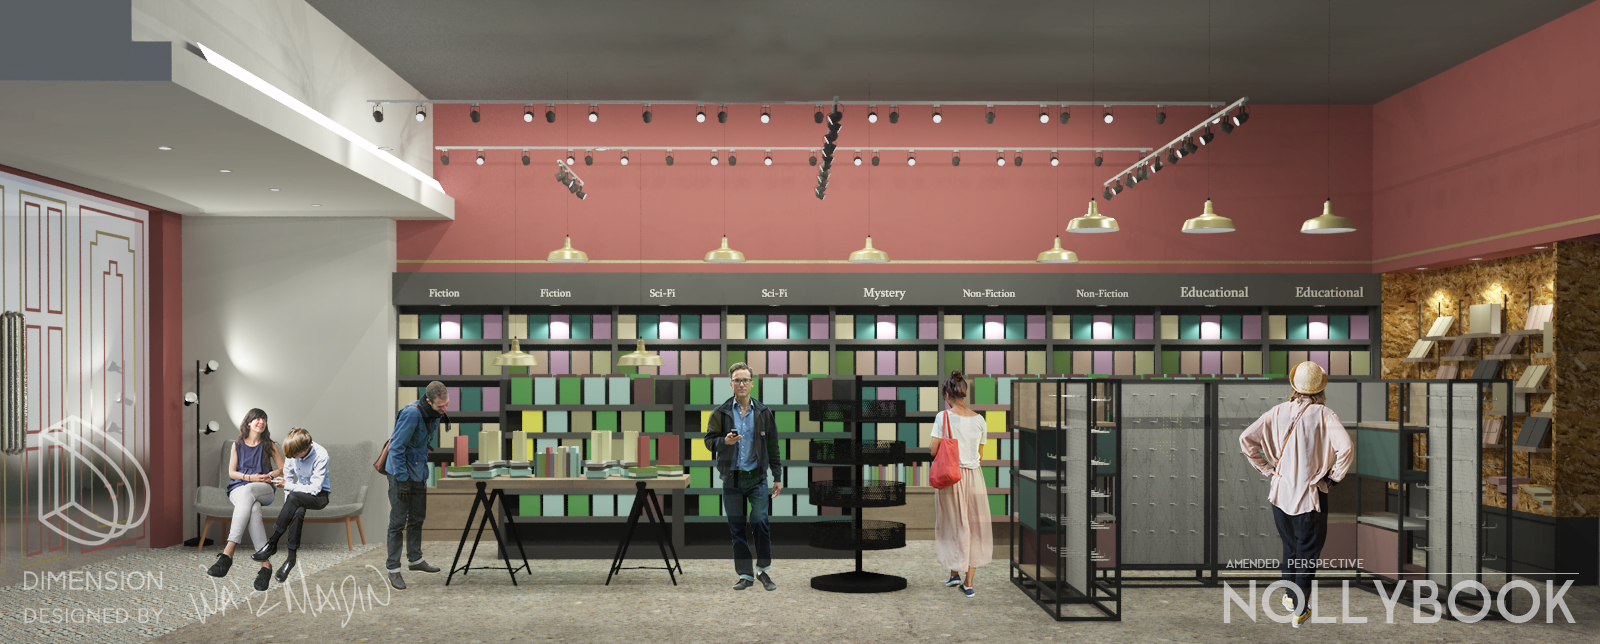 NOLLY BOOK   Retail - Bookstore